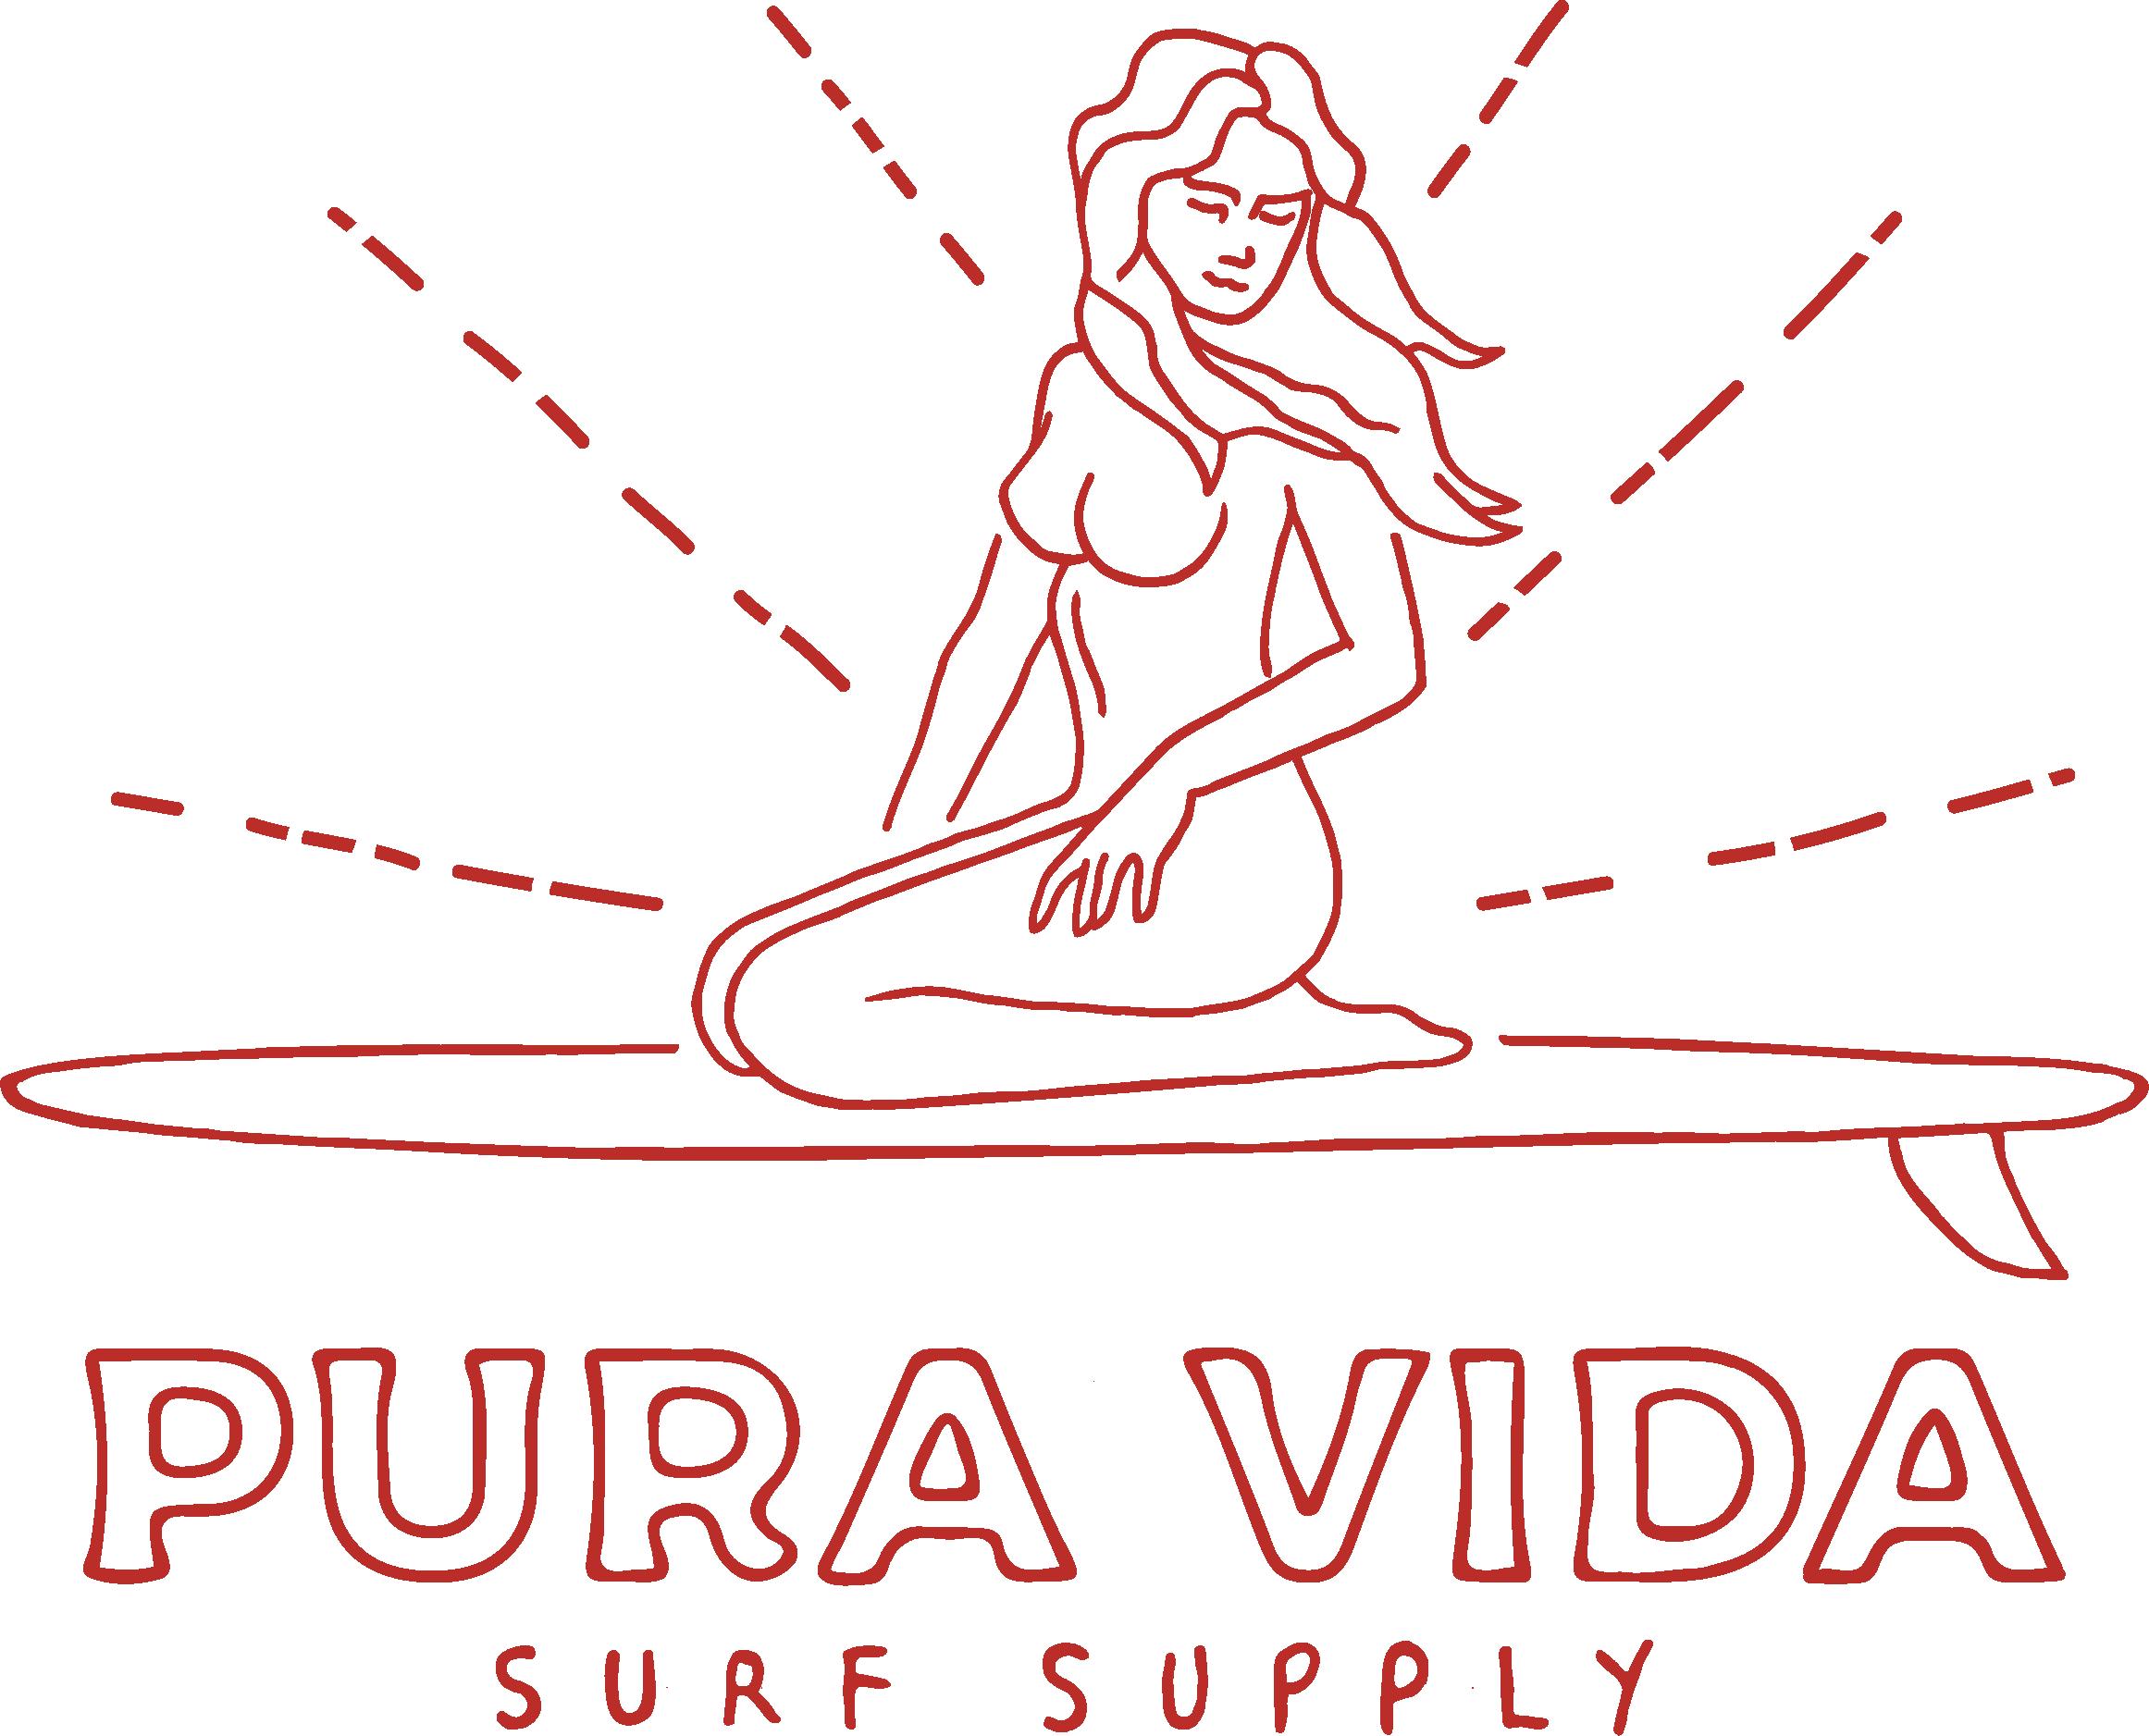 Design an iconic logo for Pura Vida Surf Supply